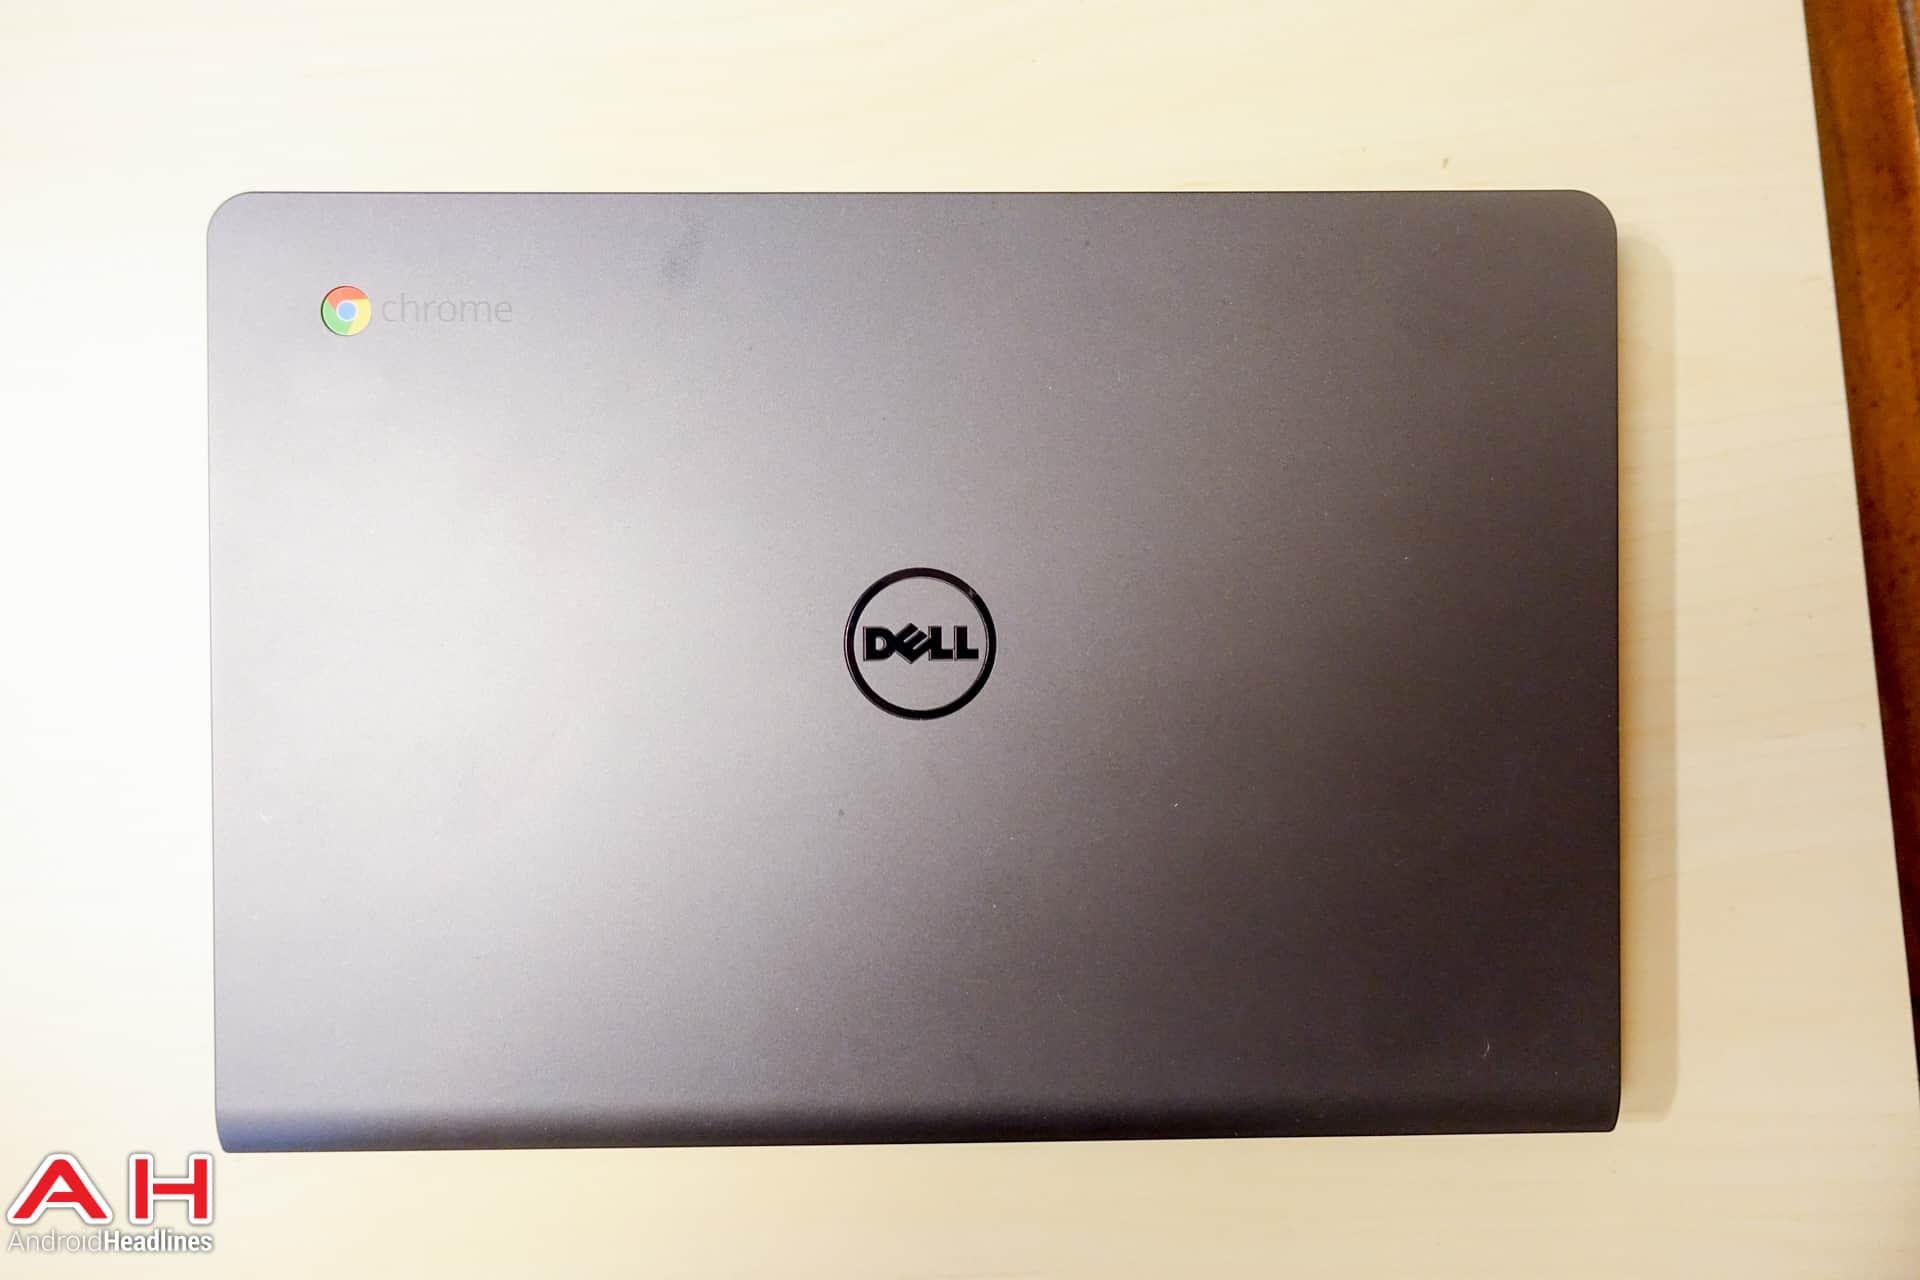 Dell-Chromebook-i3-AH-02920